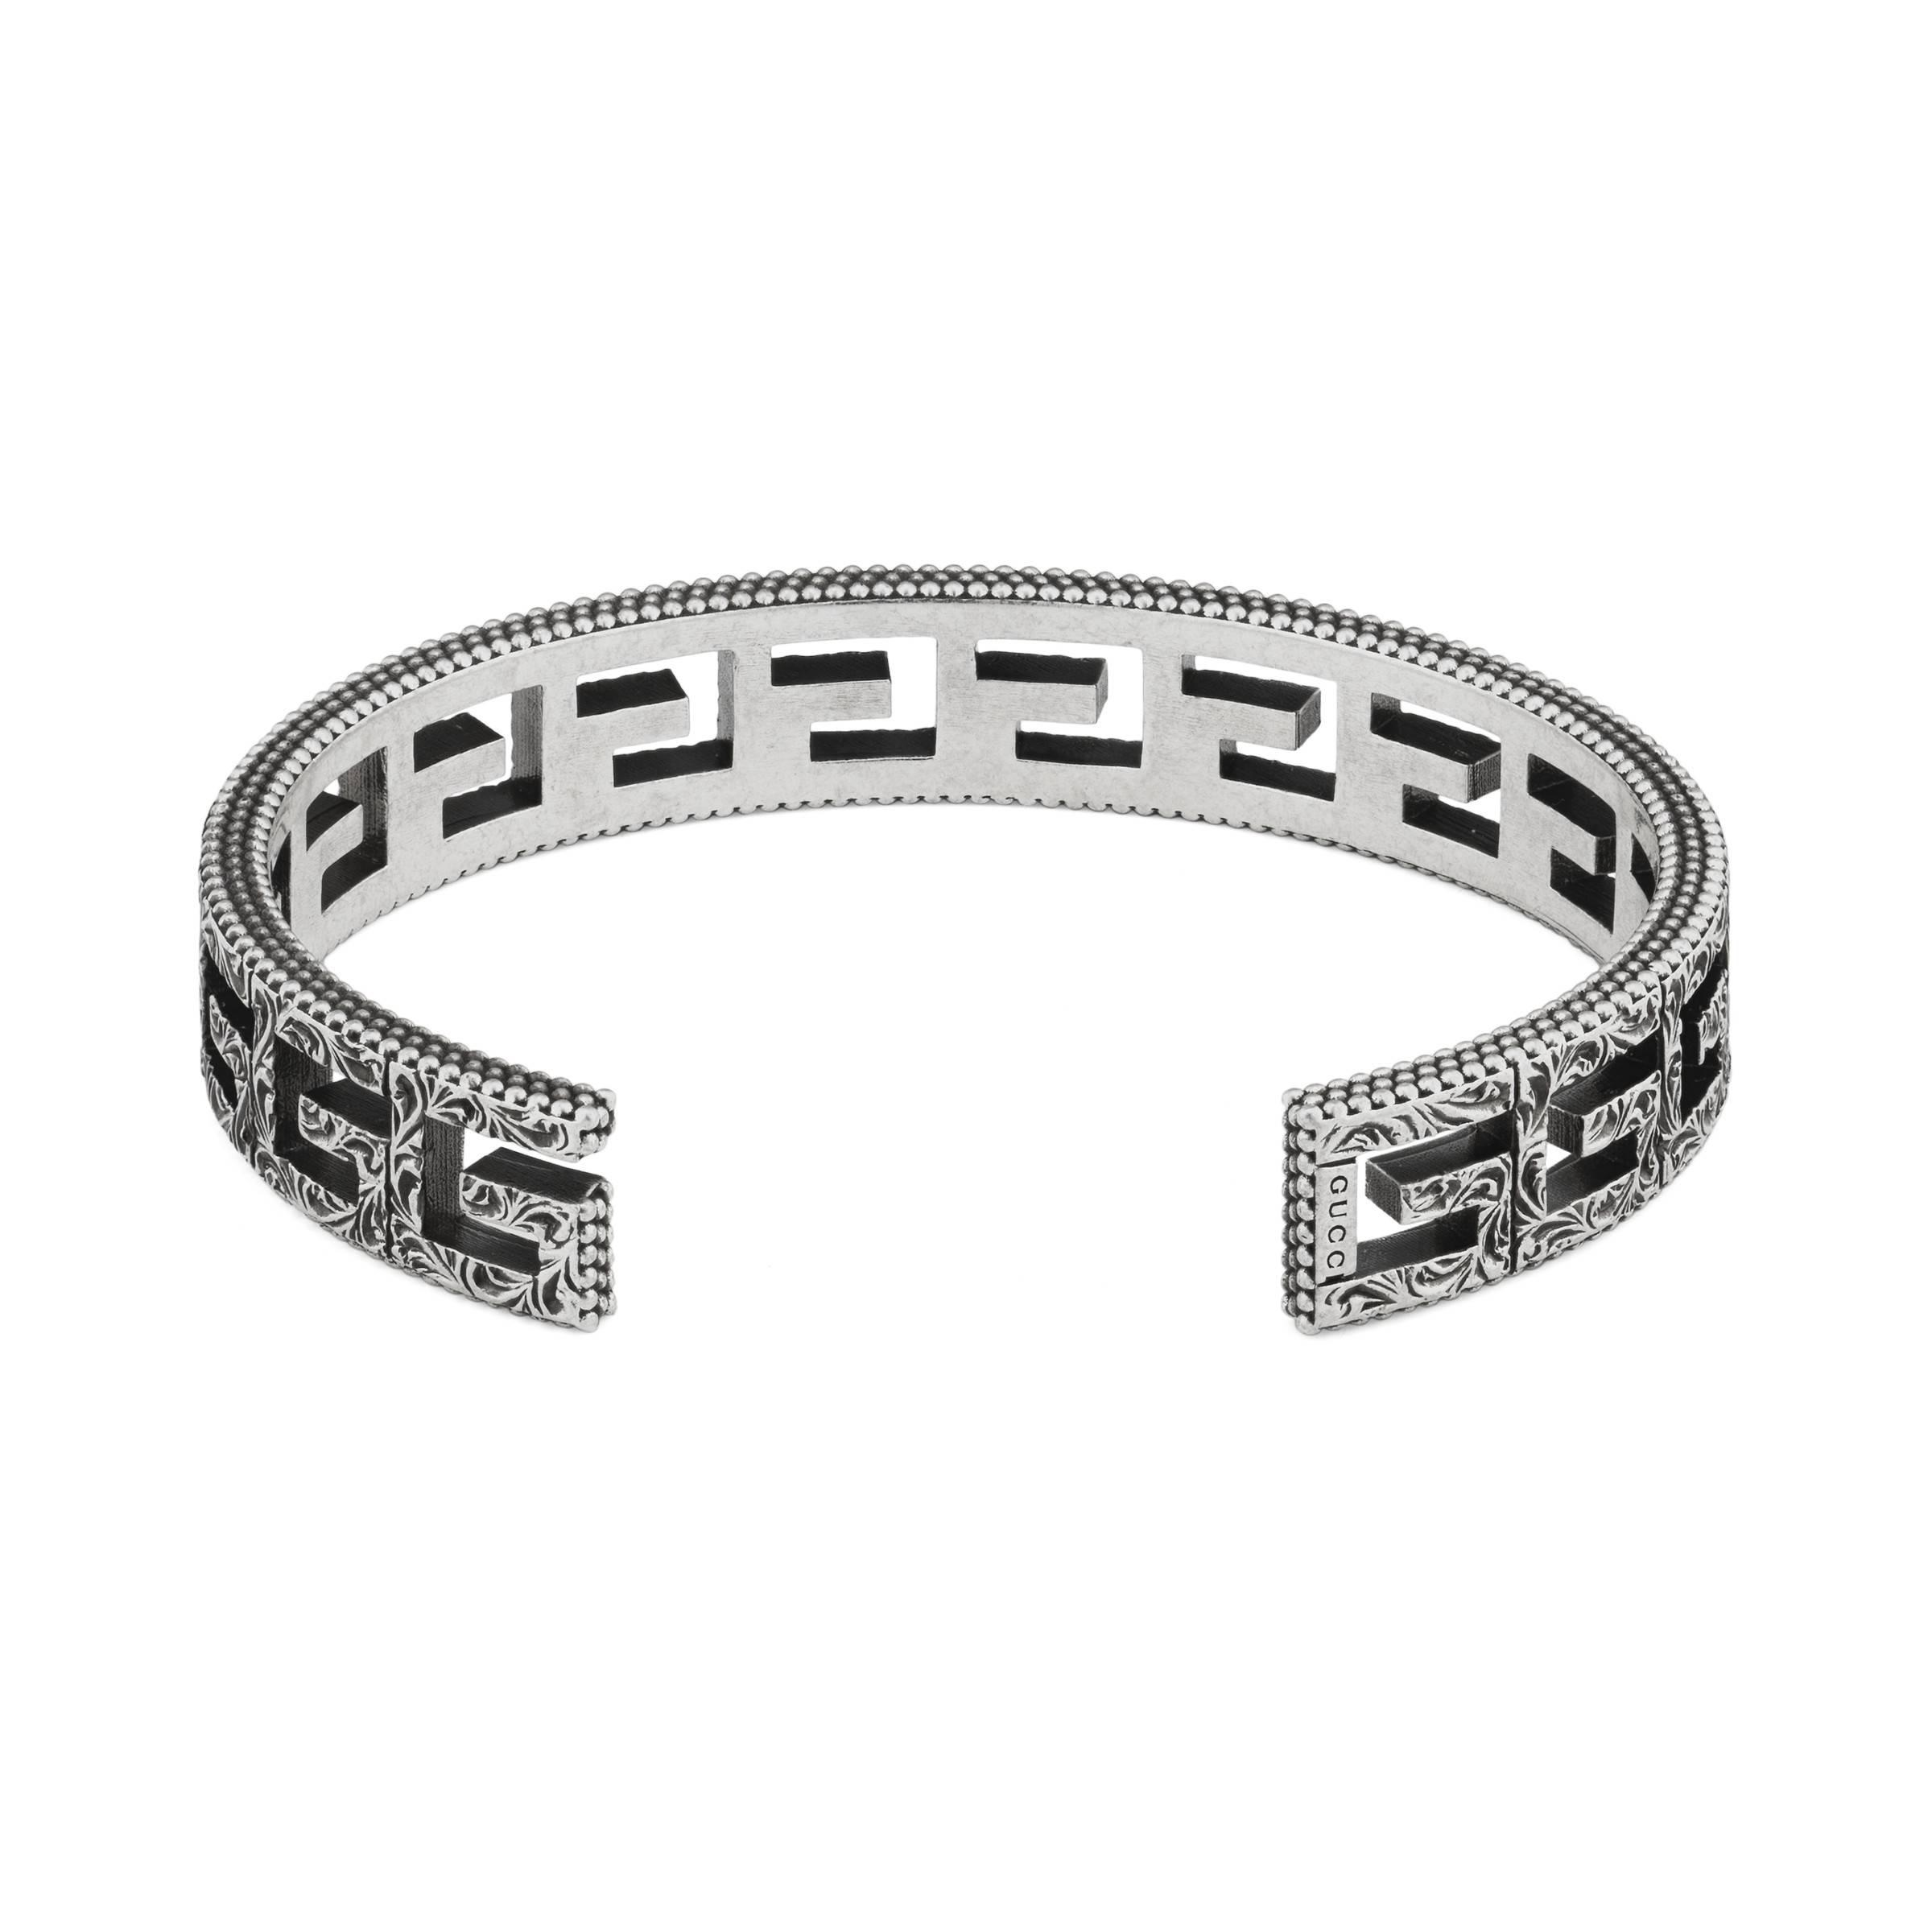 02cb75dd3c4a2 Gucci Cuff Bracelet With Square G Motif in Metallic for Men - Lyst